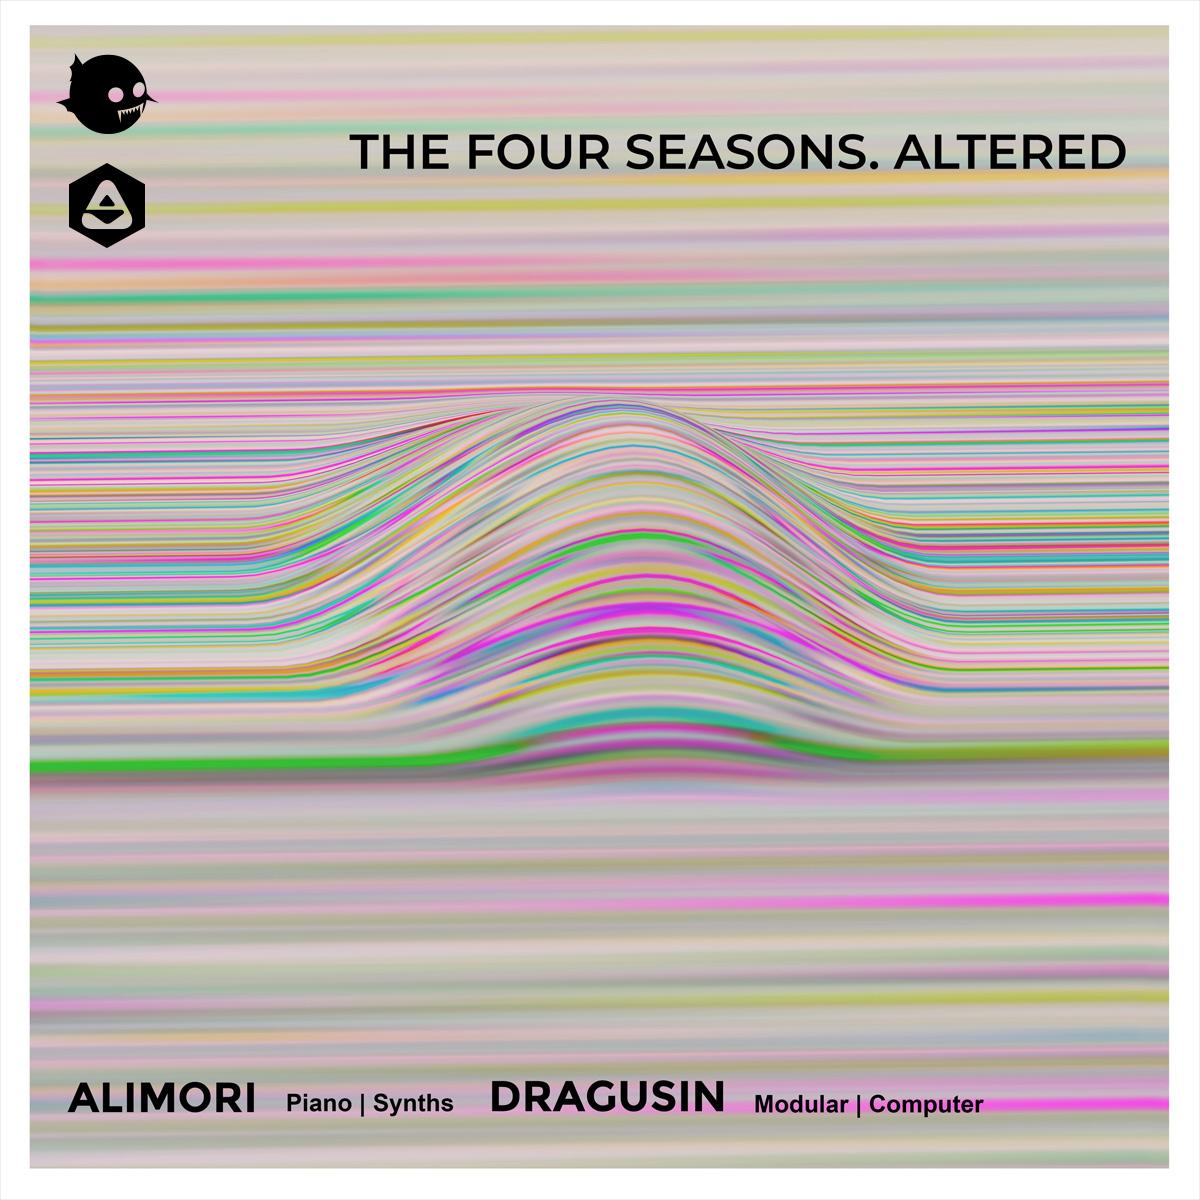 Alimori, Dragusin - Spring [Longcut Records 01]